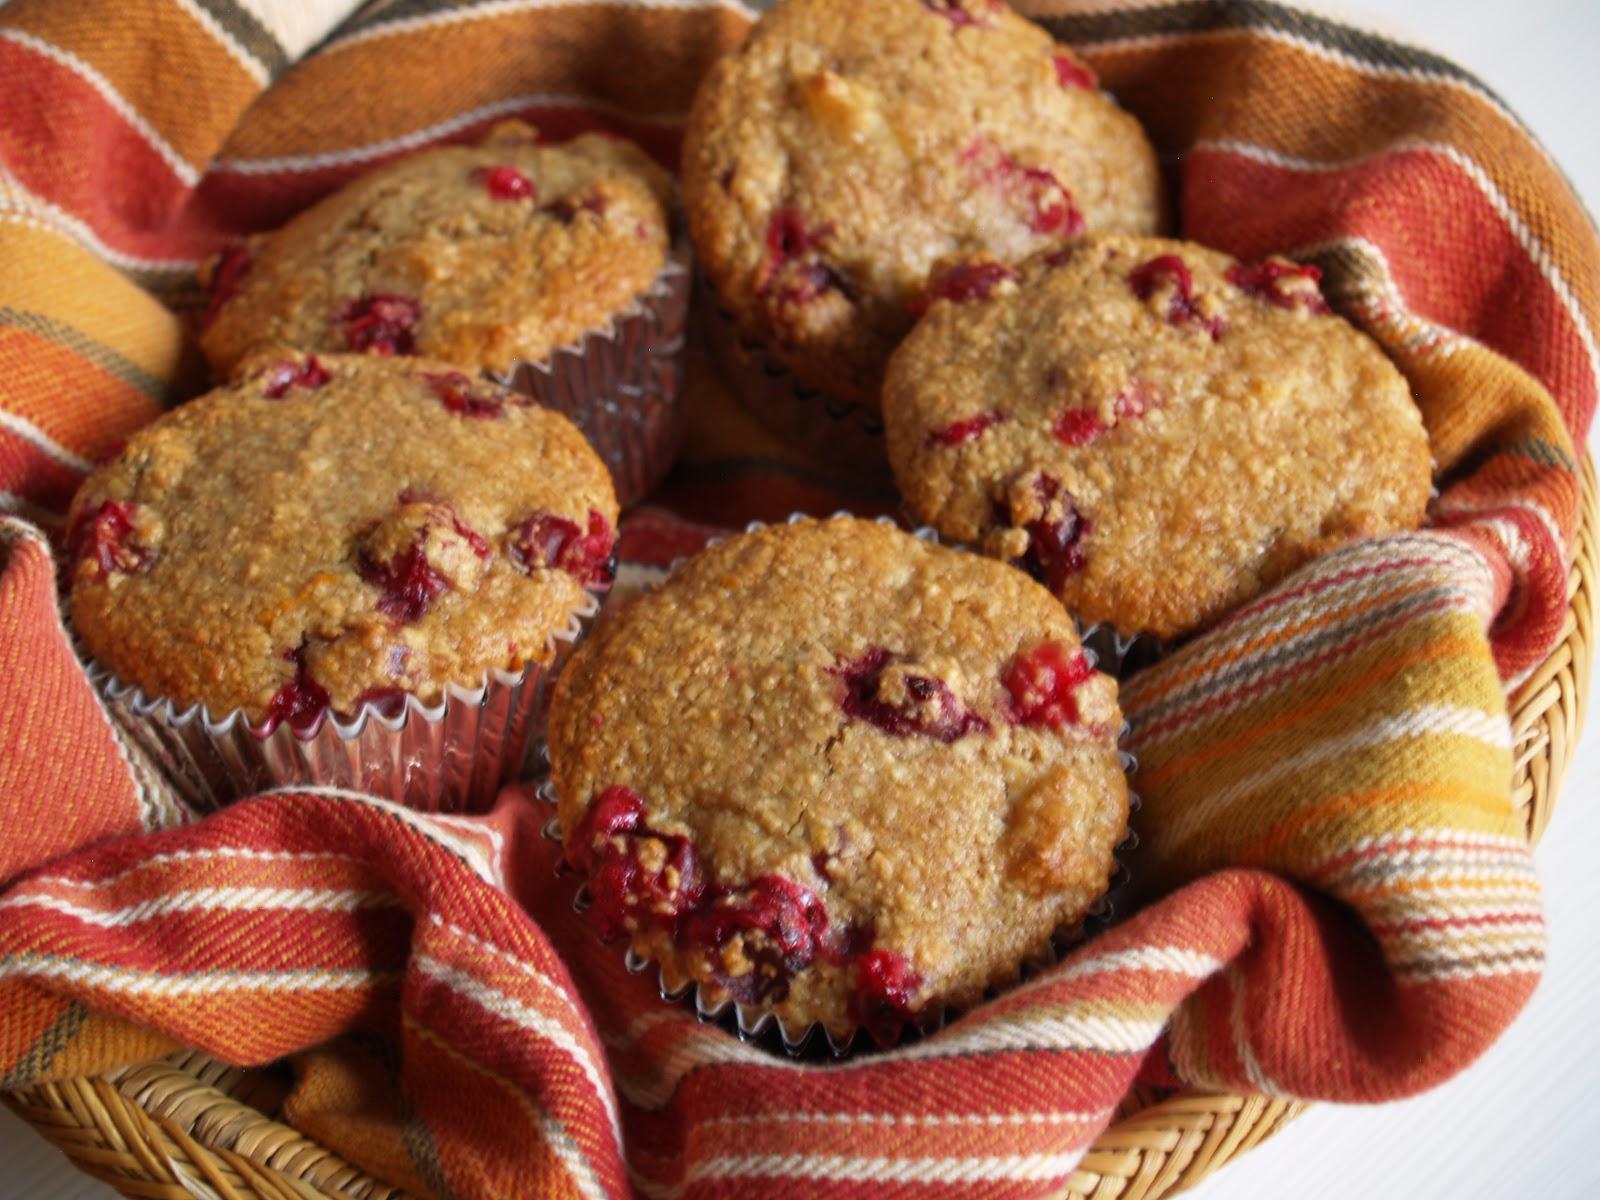 Recipe for apple oat bran muffins